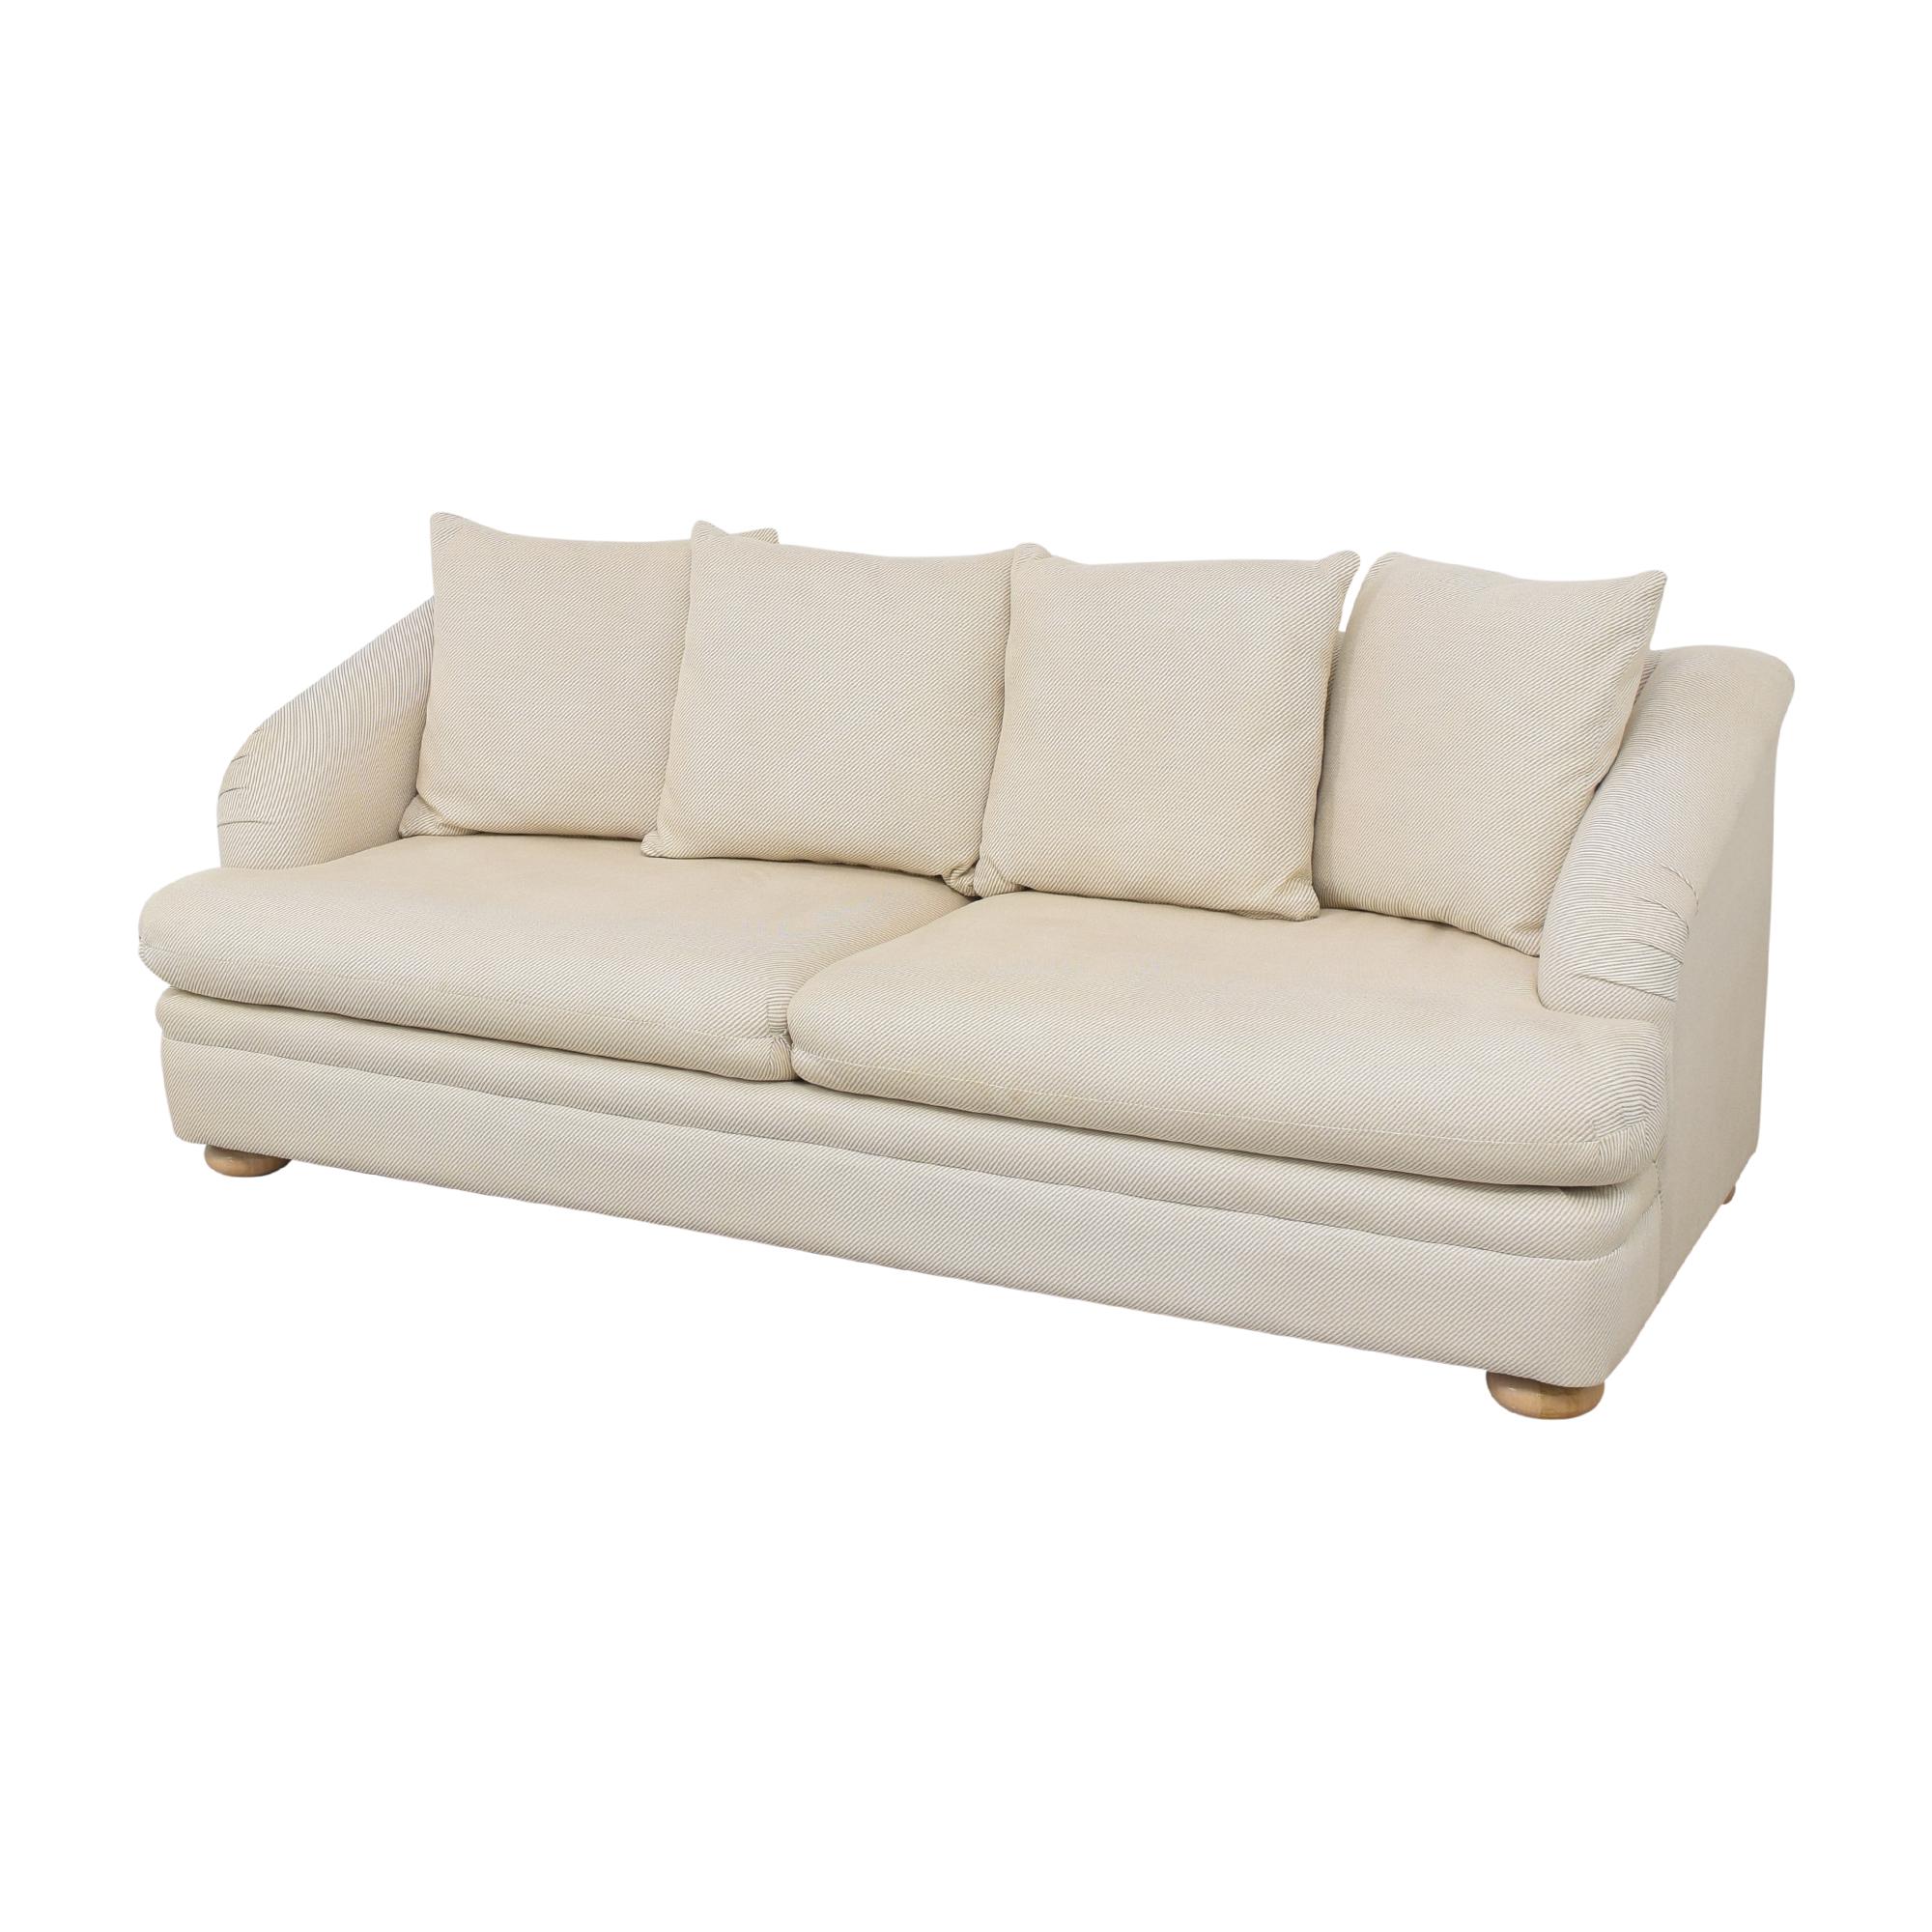 McCreary Modern McCreary Modern English Roll Arm Sofa nj